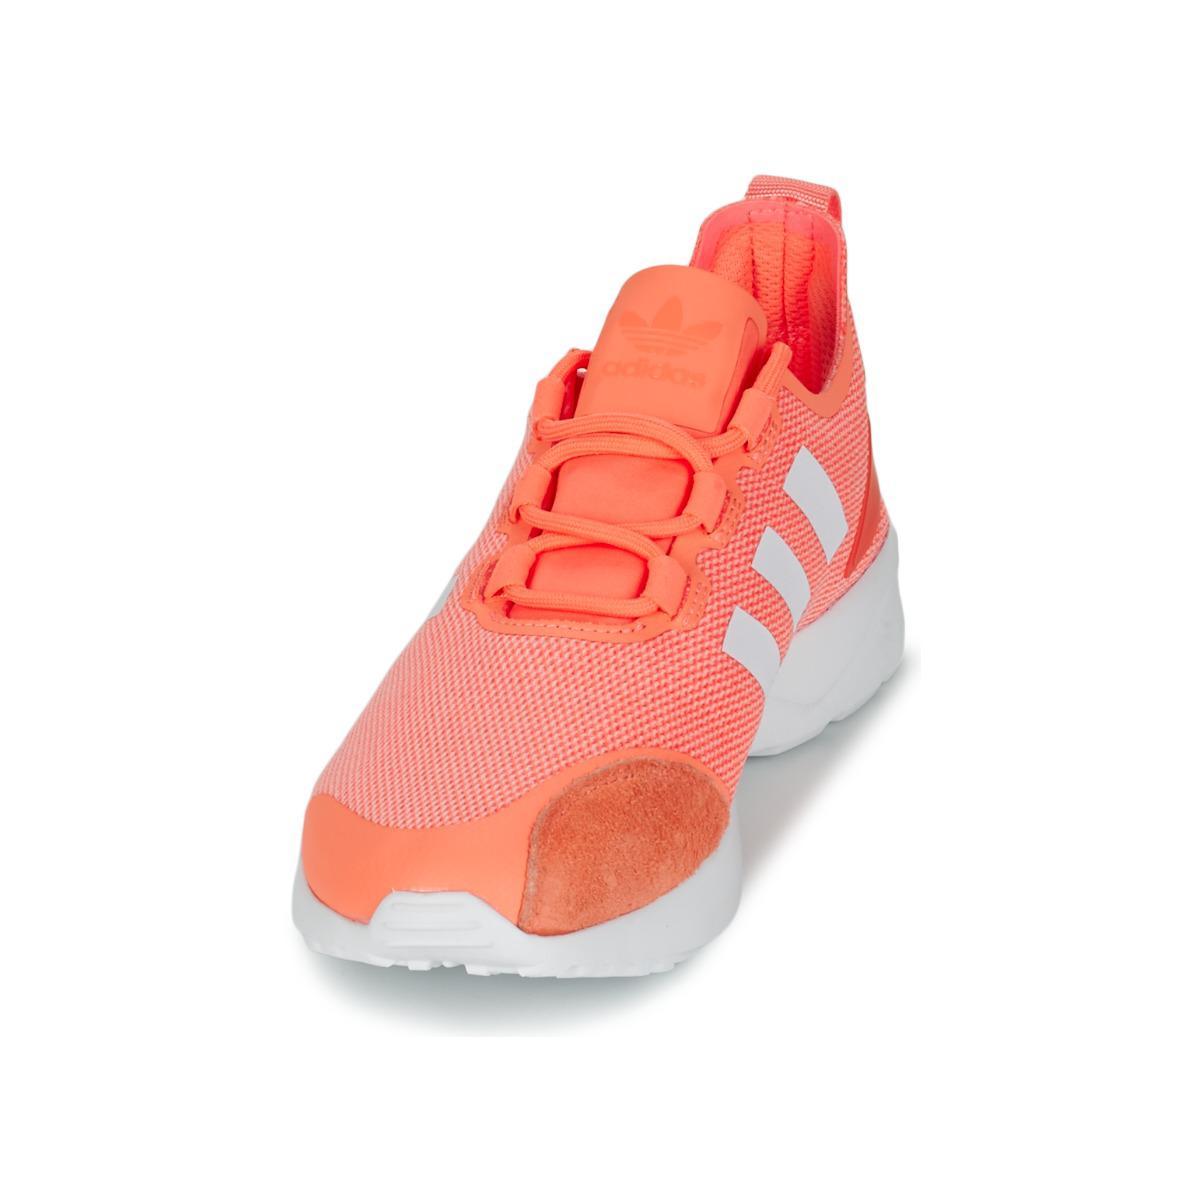 pretty nice c1cac 5bc8a Adidas - ZX FLUX ADV VERVE W femmes Chaussures en orange - Lyst. Afficher  en plein écran